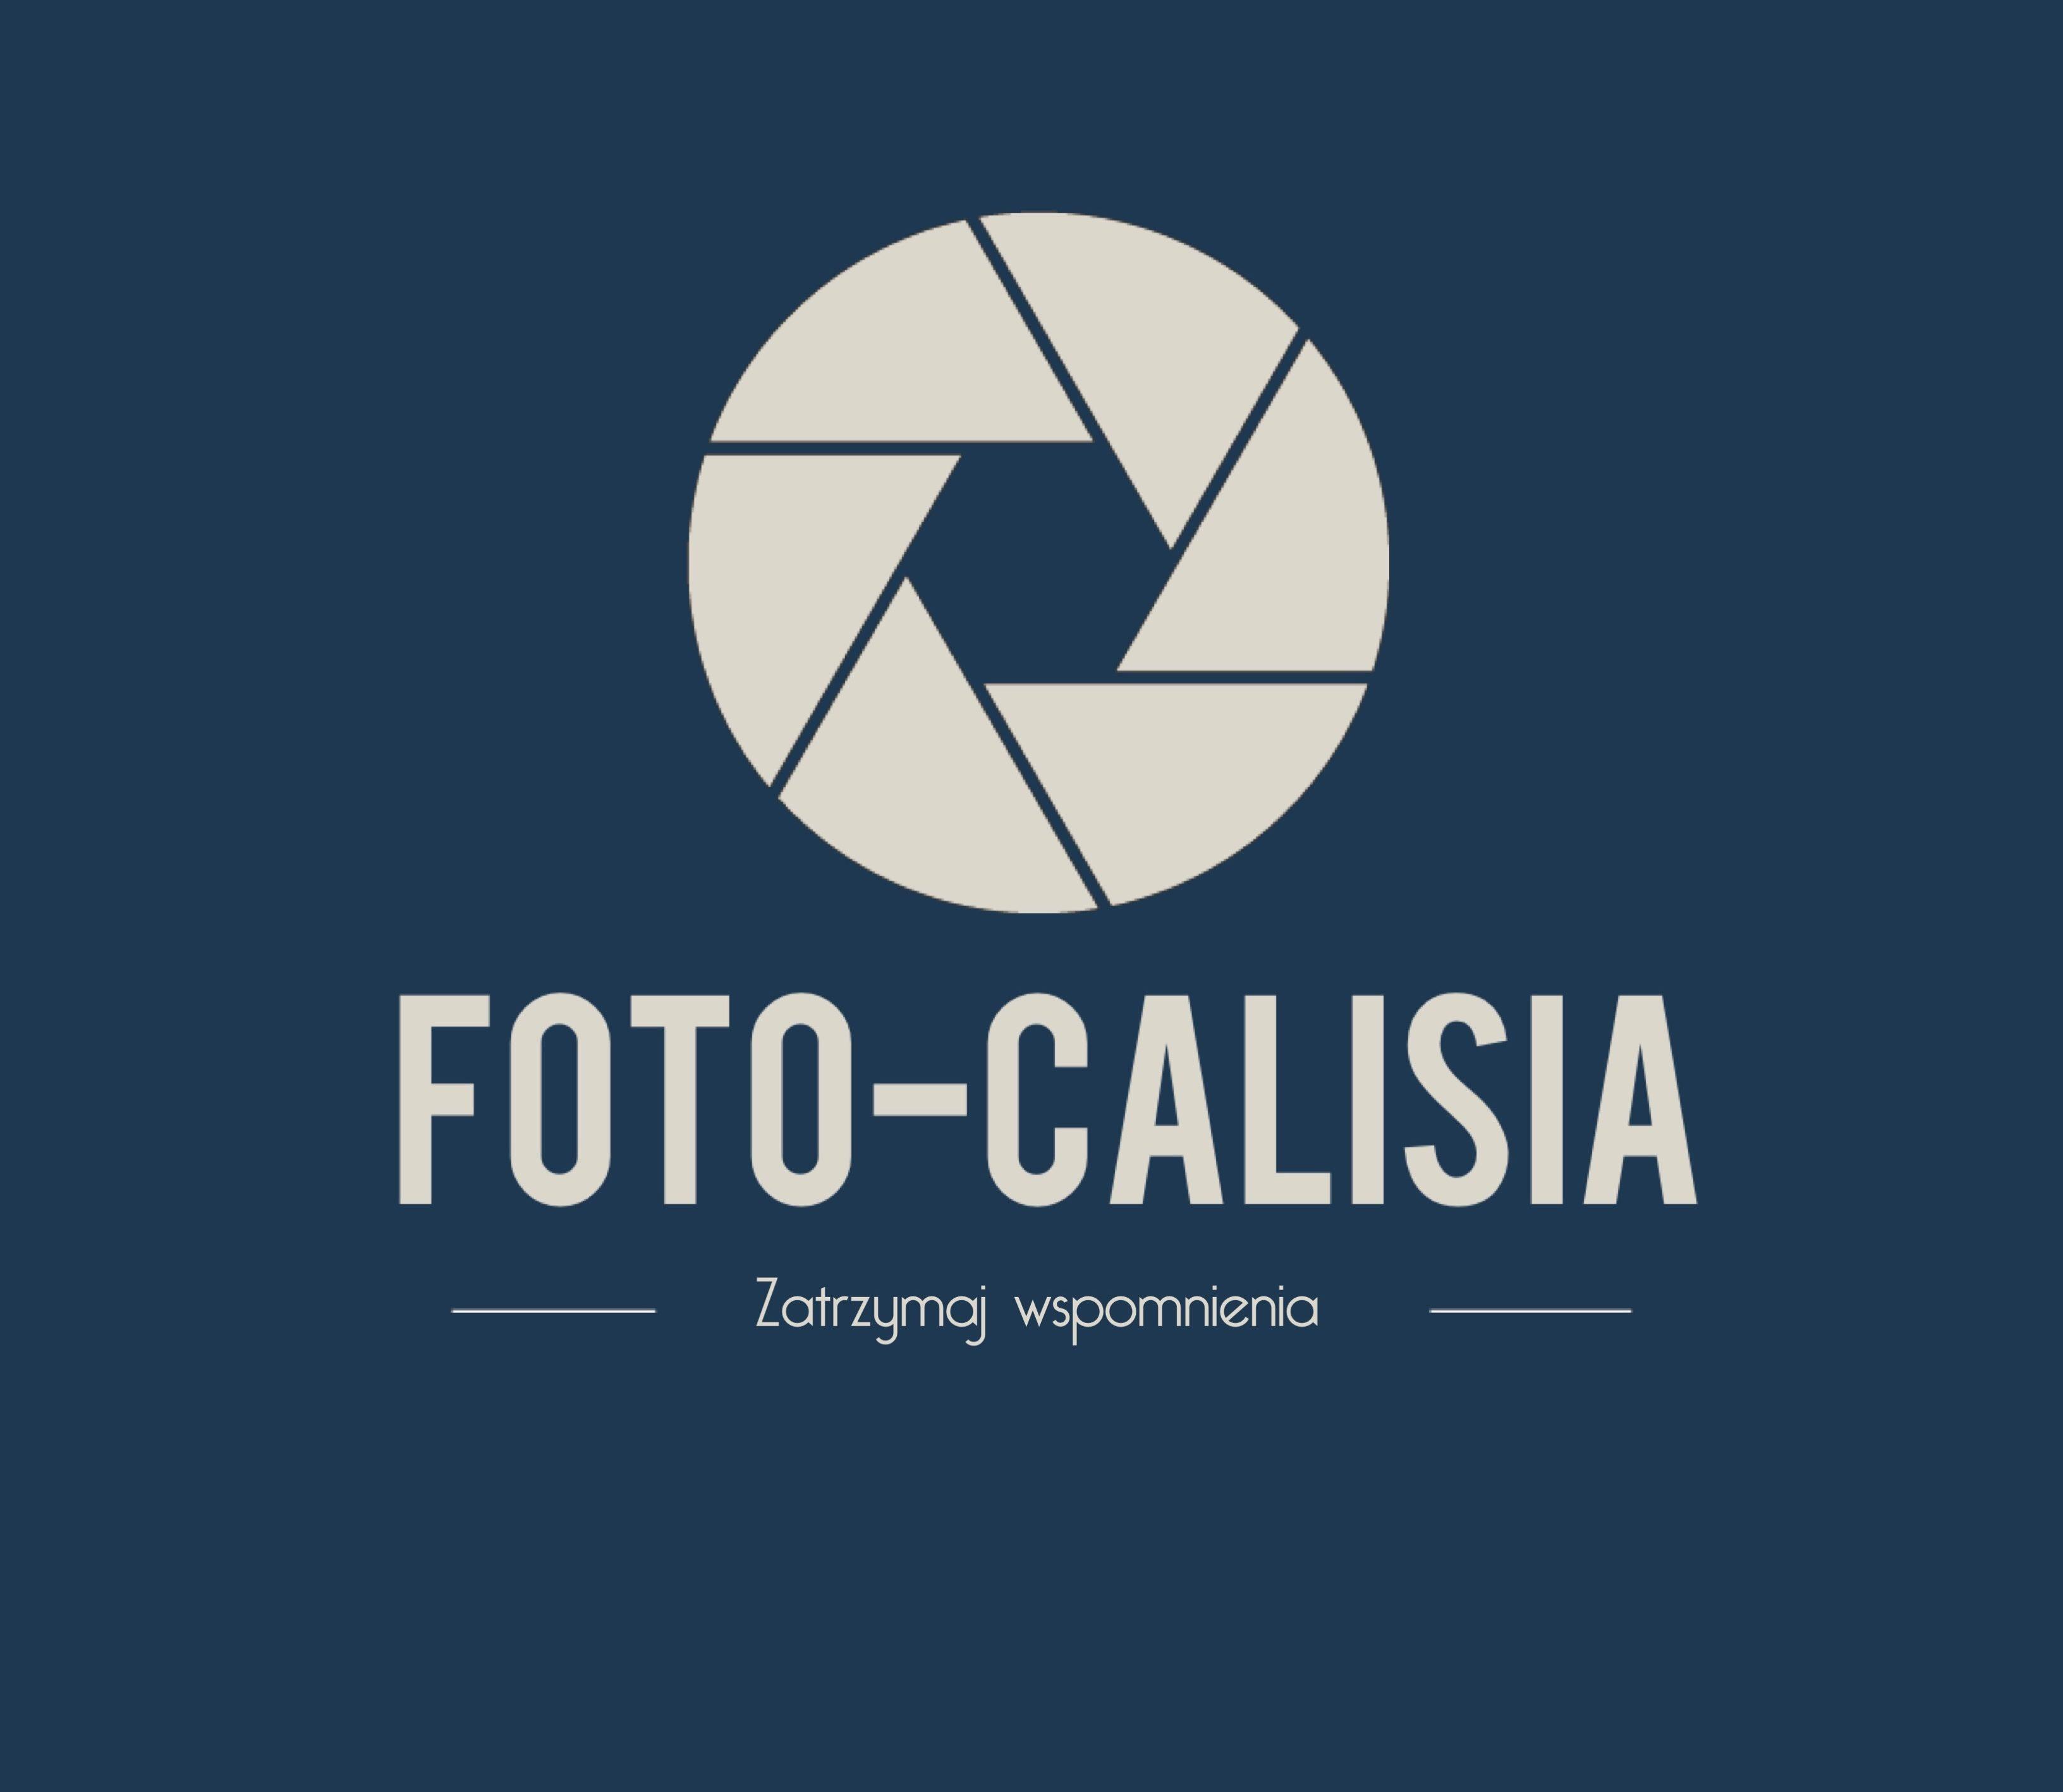 Foto Calisia